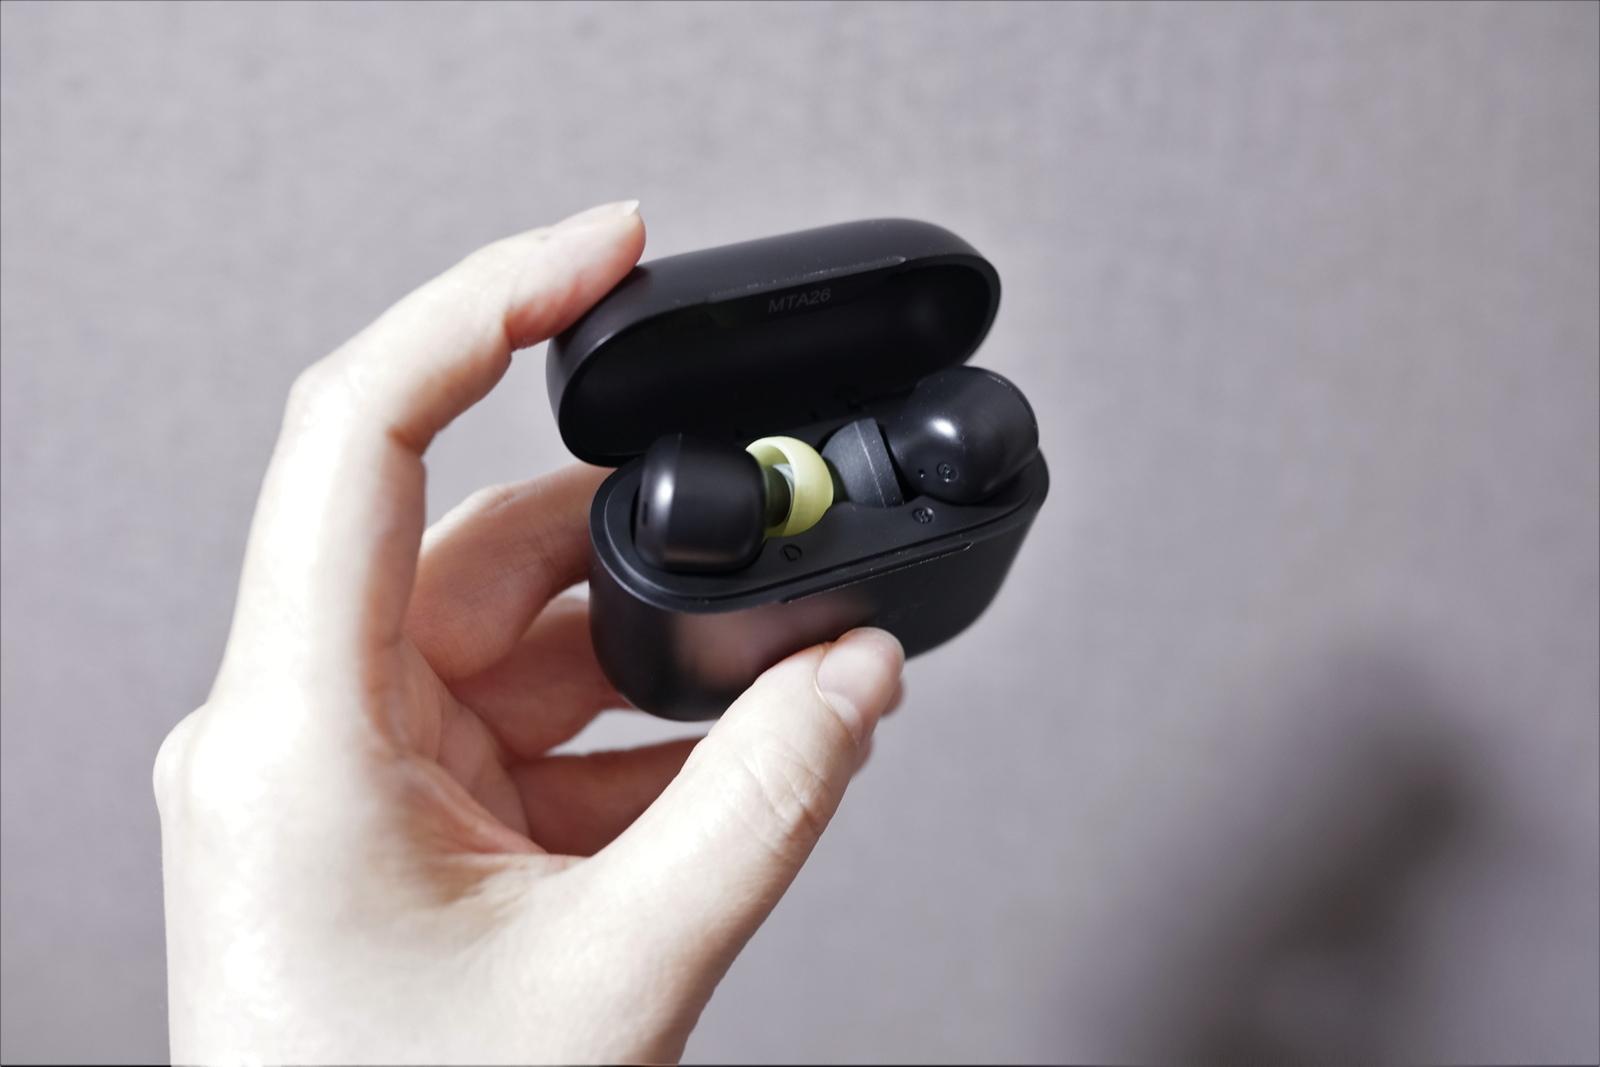 ACEFAST T1の装着感・他社製のイヤーピースとの互換性について